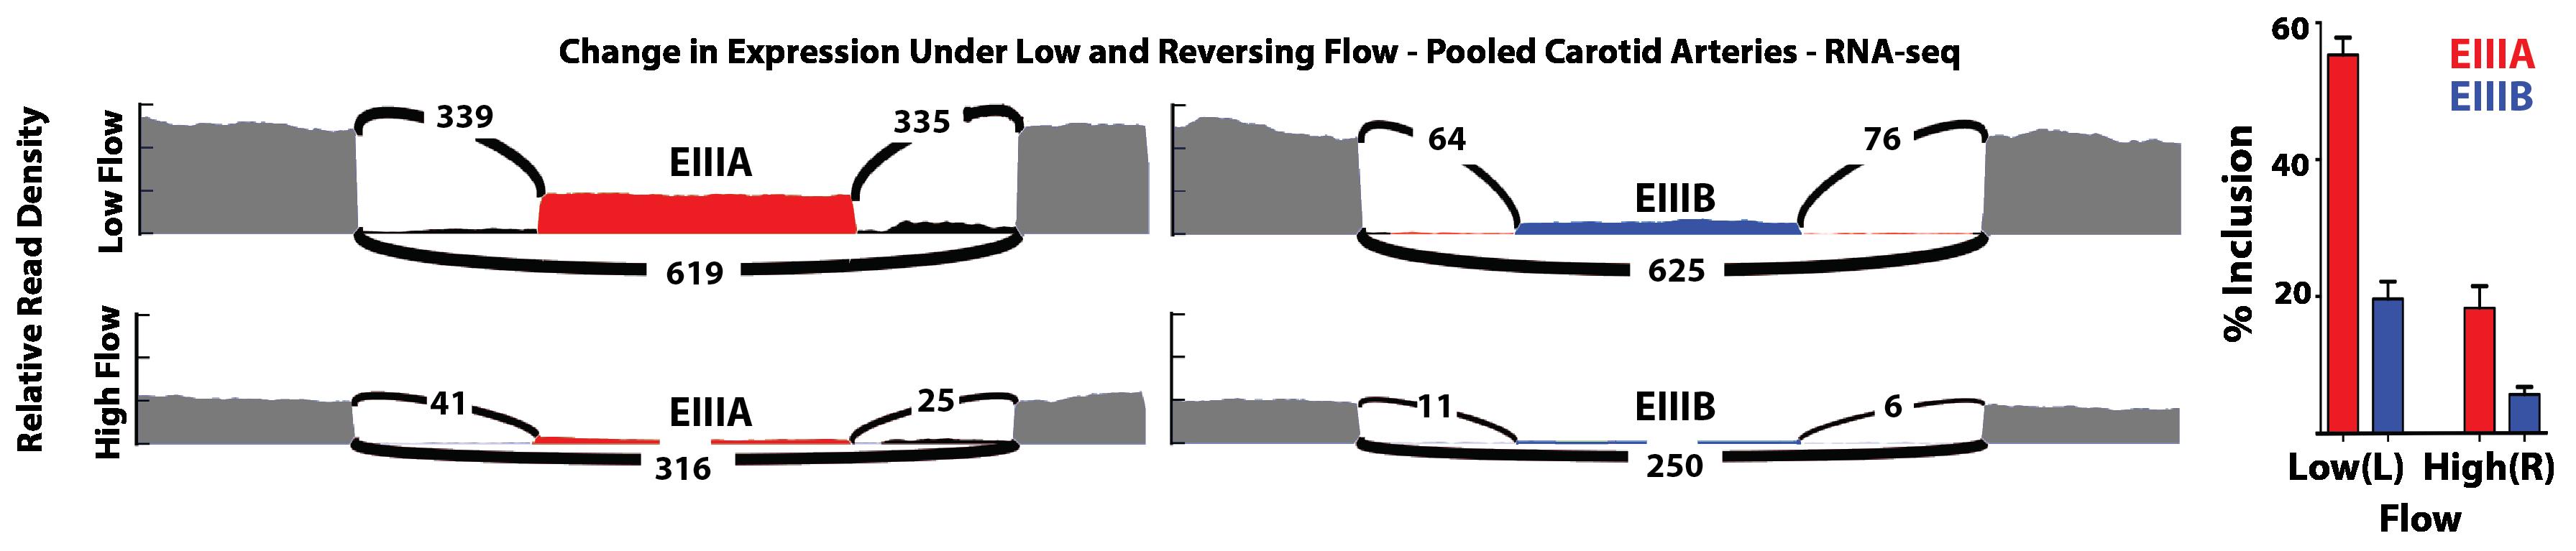 Splicing image